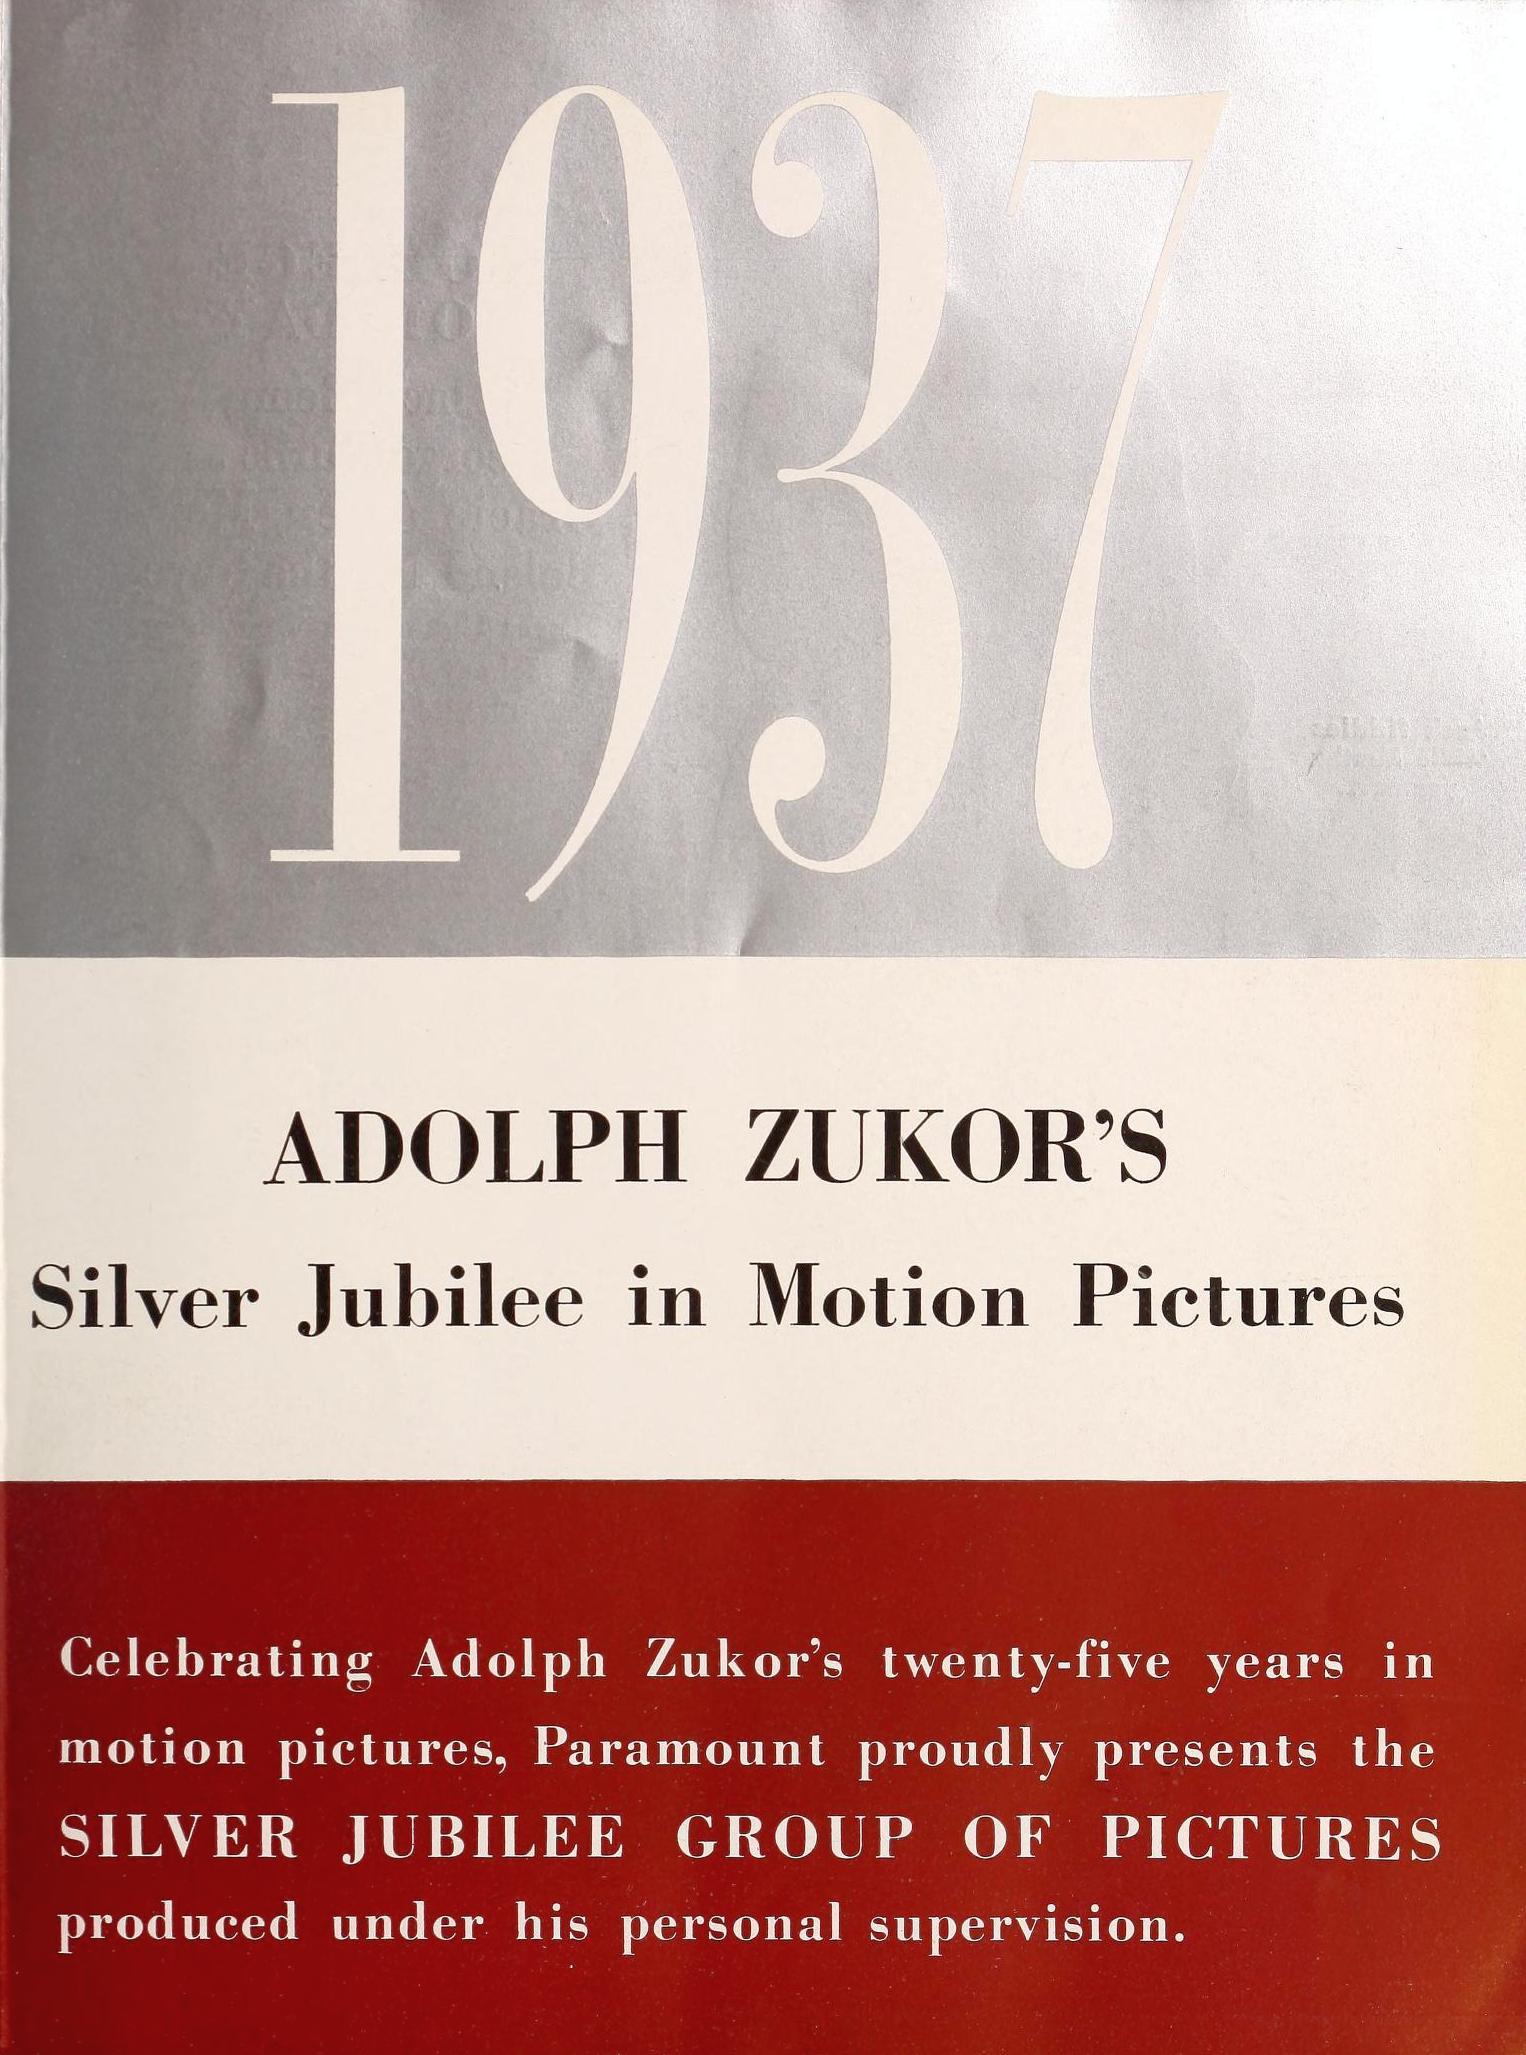 adolph zukor 010537 film daily 10a